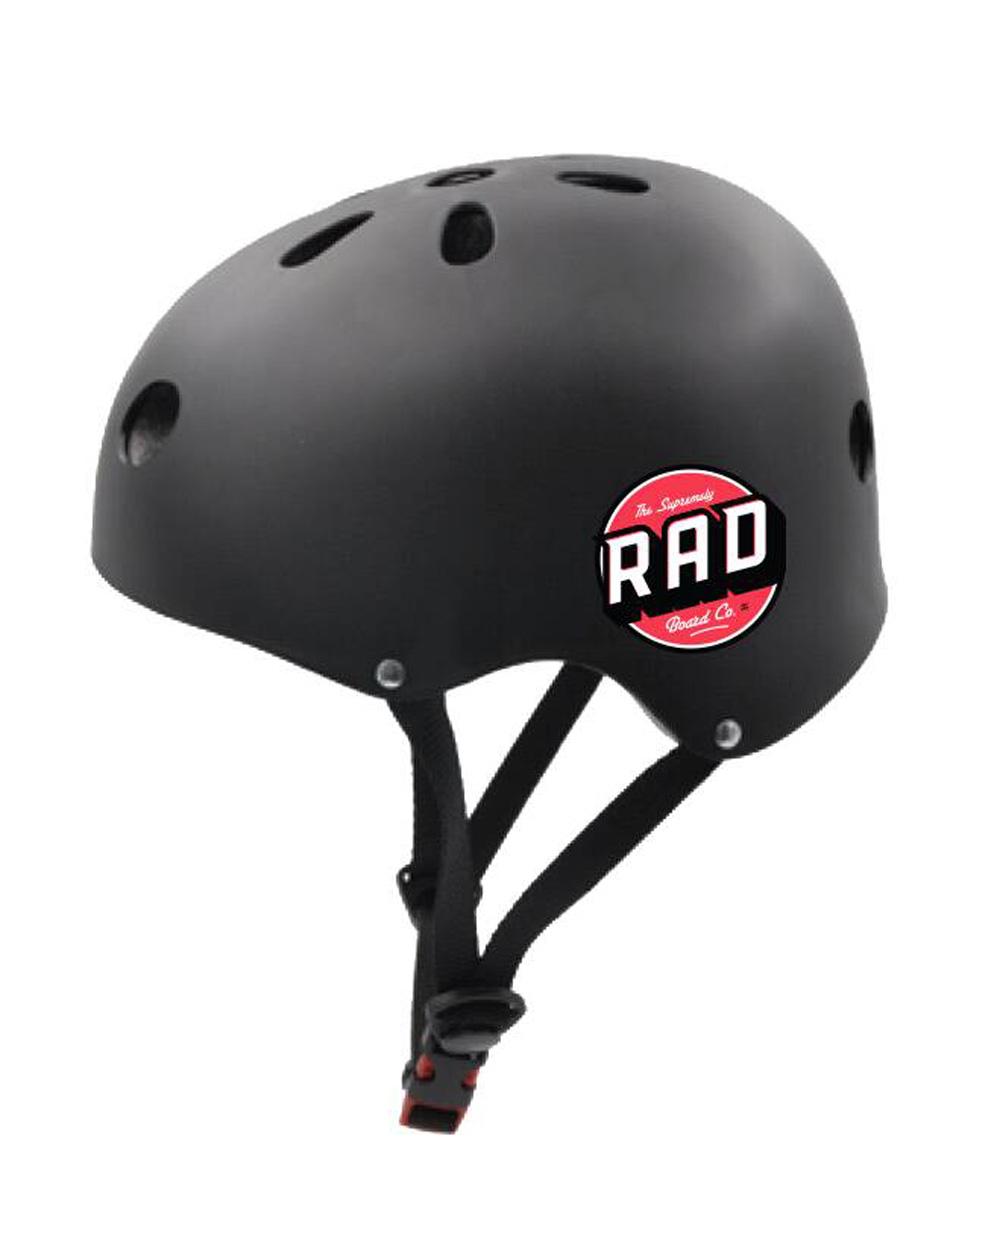 Rad Multi Skate Skateboard Helmet Black